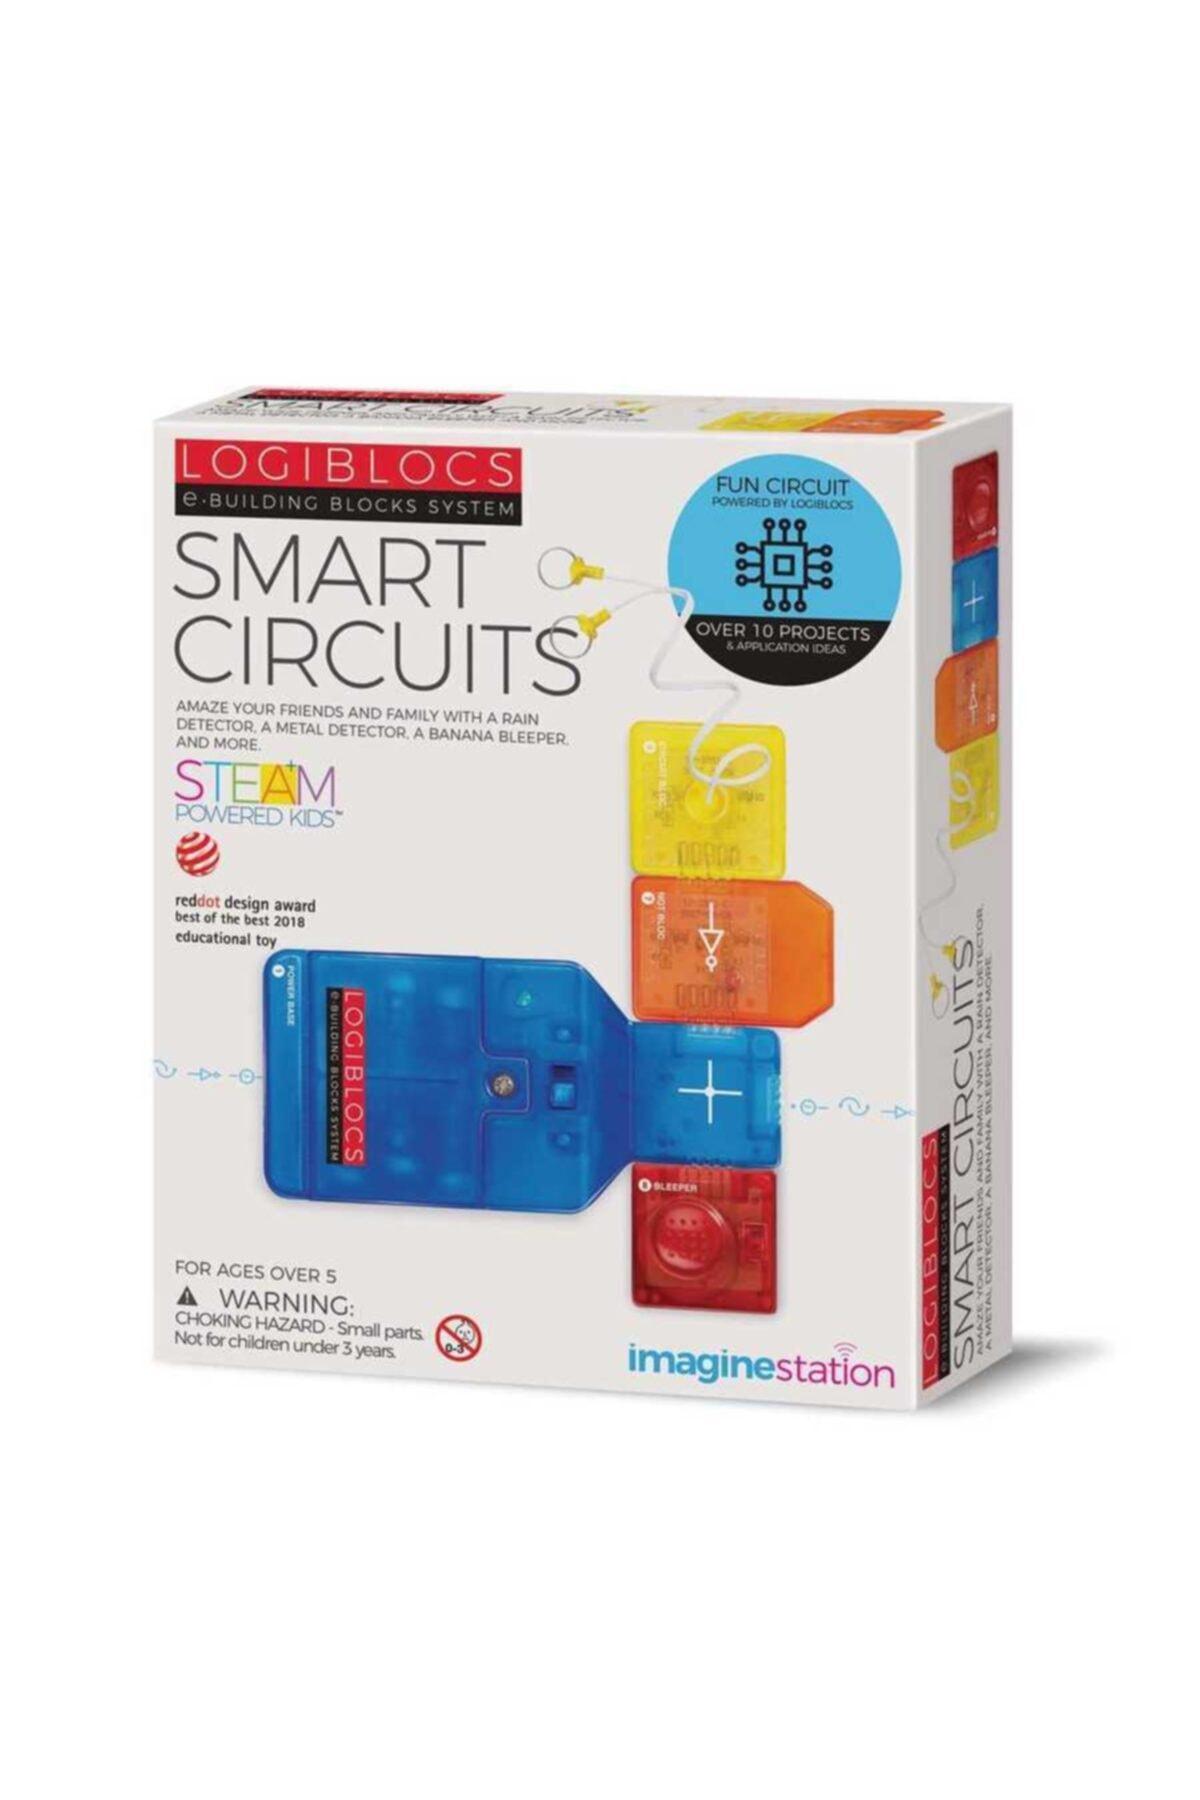 Logiblocs Smart Circuit 1